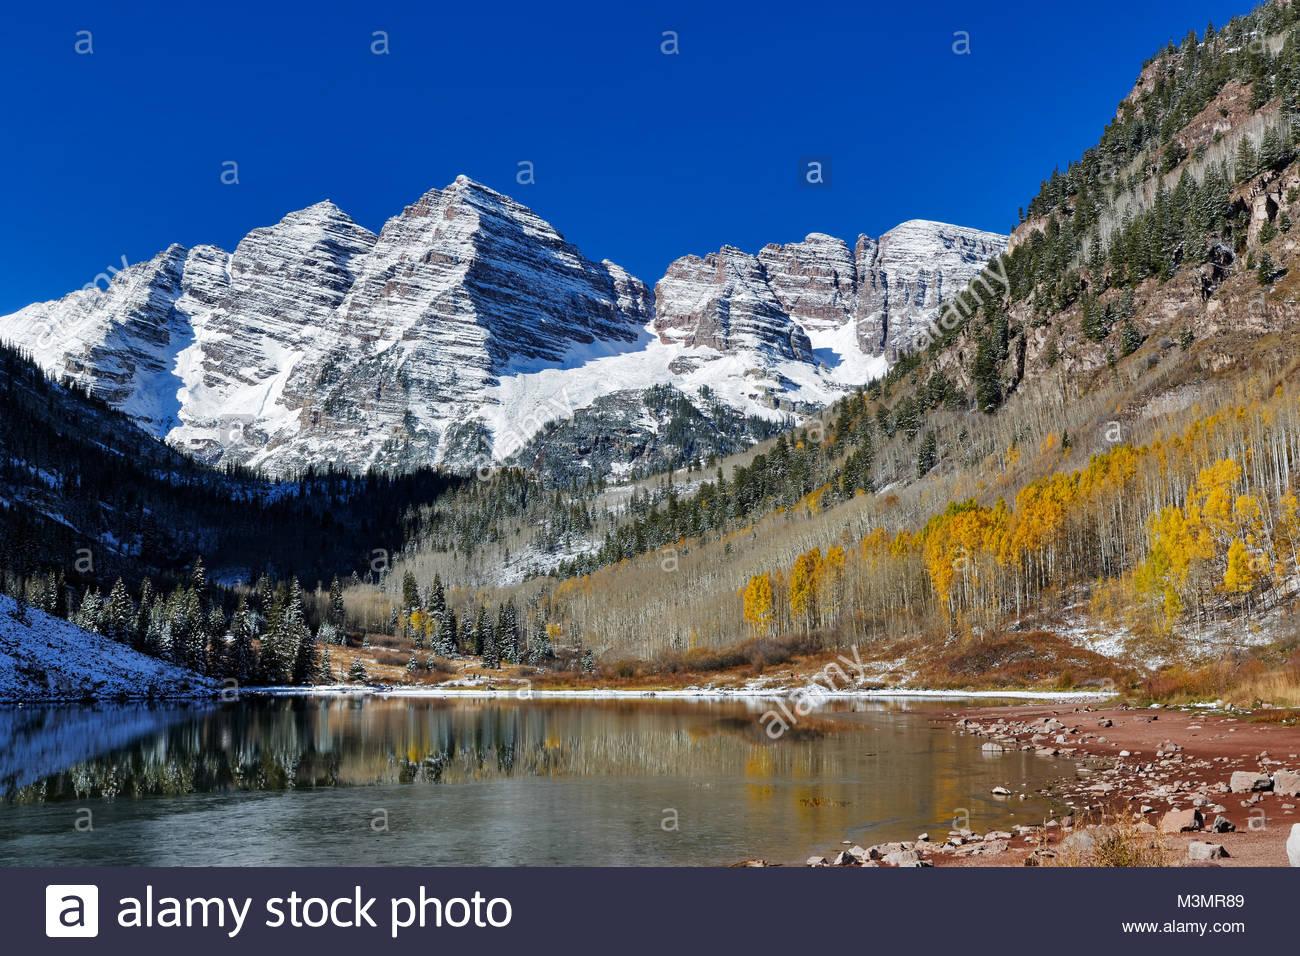 Maroon Bells in Aspen Colorado in late fall - Stock Image